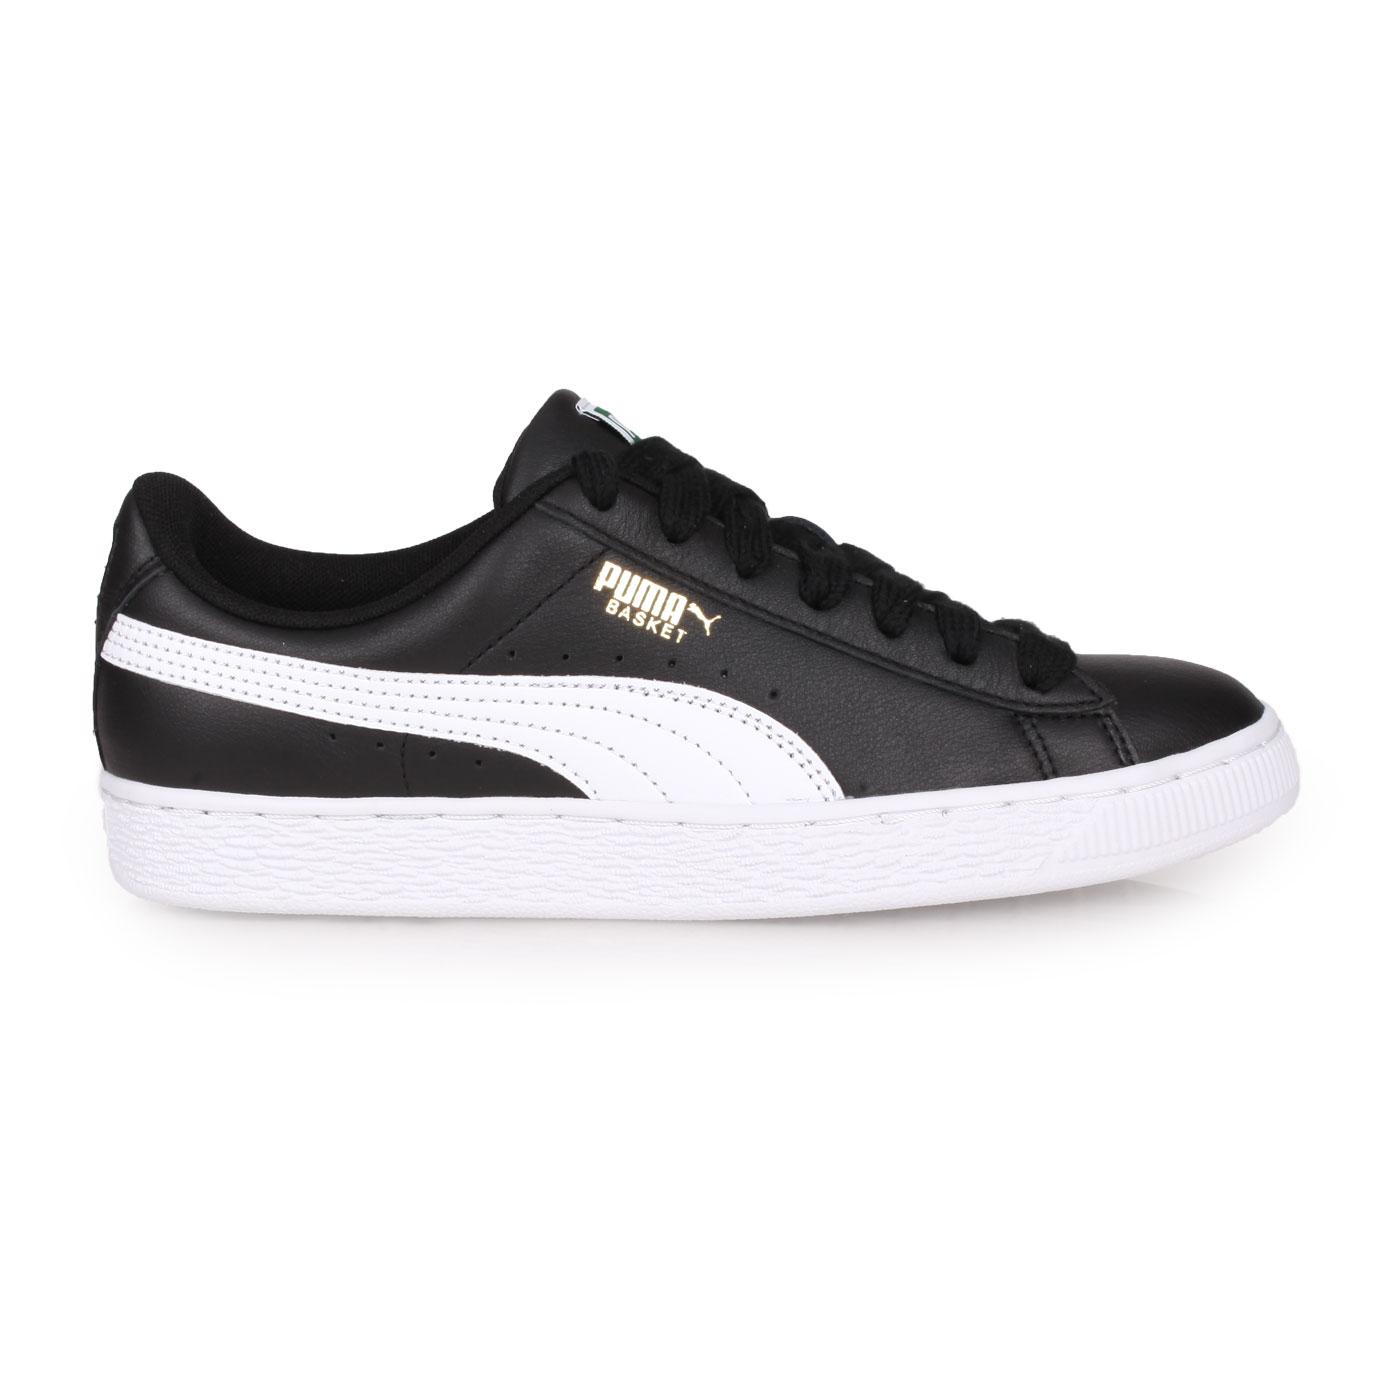 PUMA 經典復古休閒鞋  @BASKET CLASSIC LFS@35436717 - 黑白